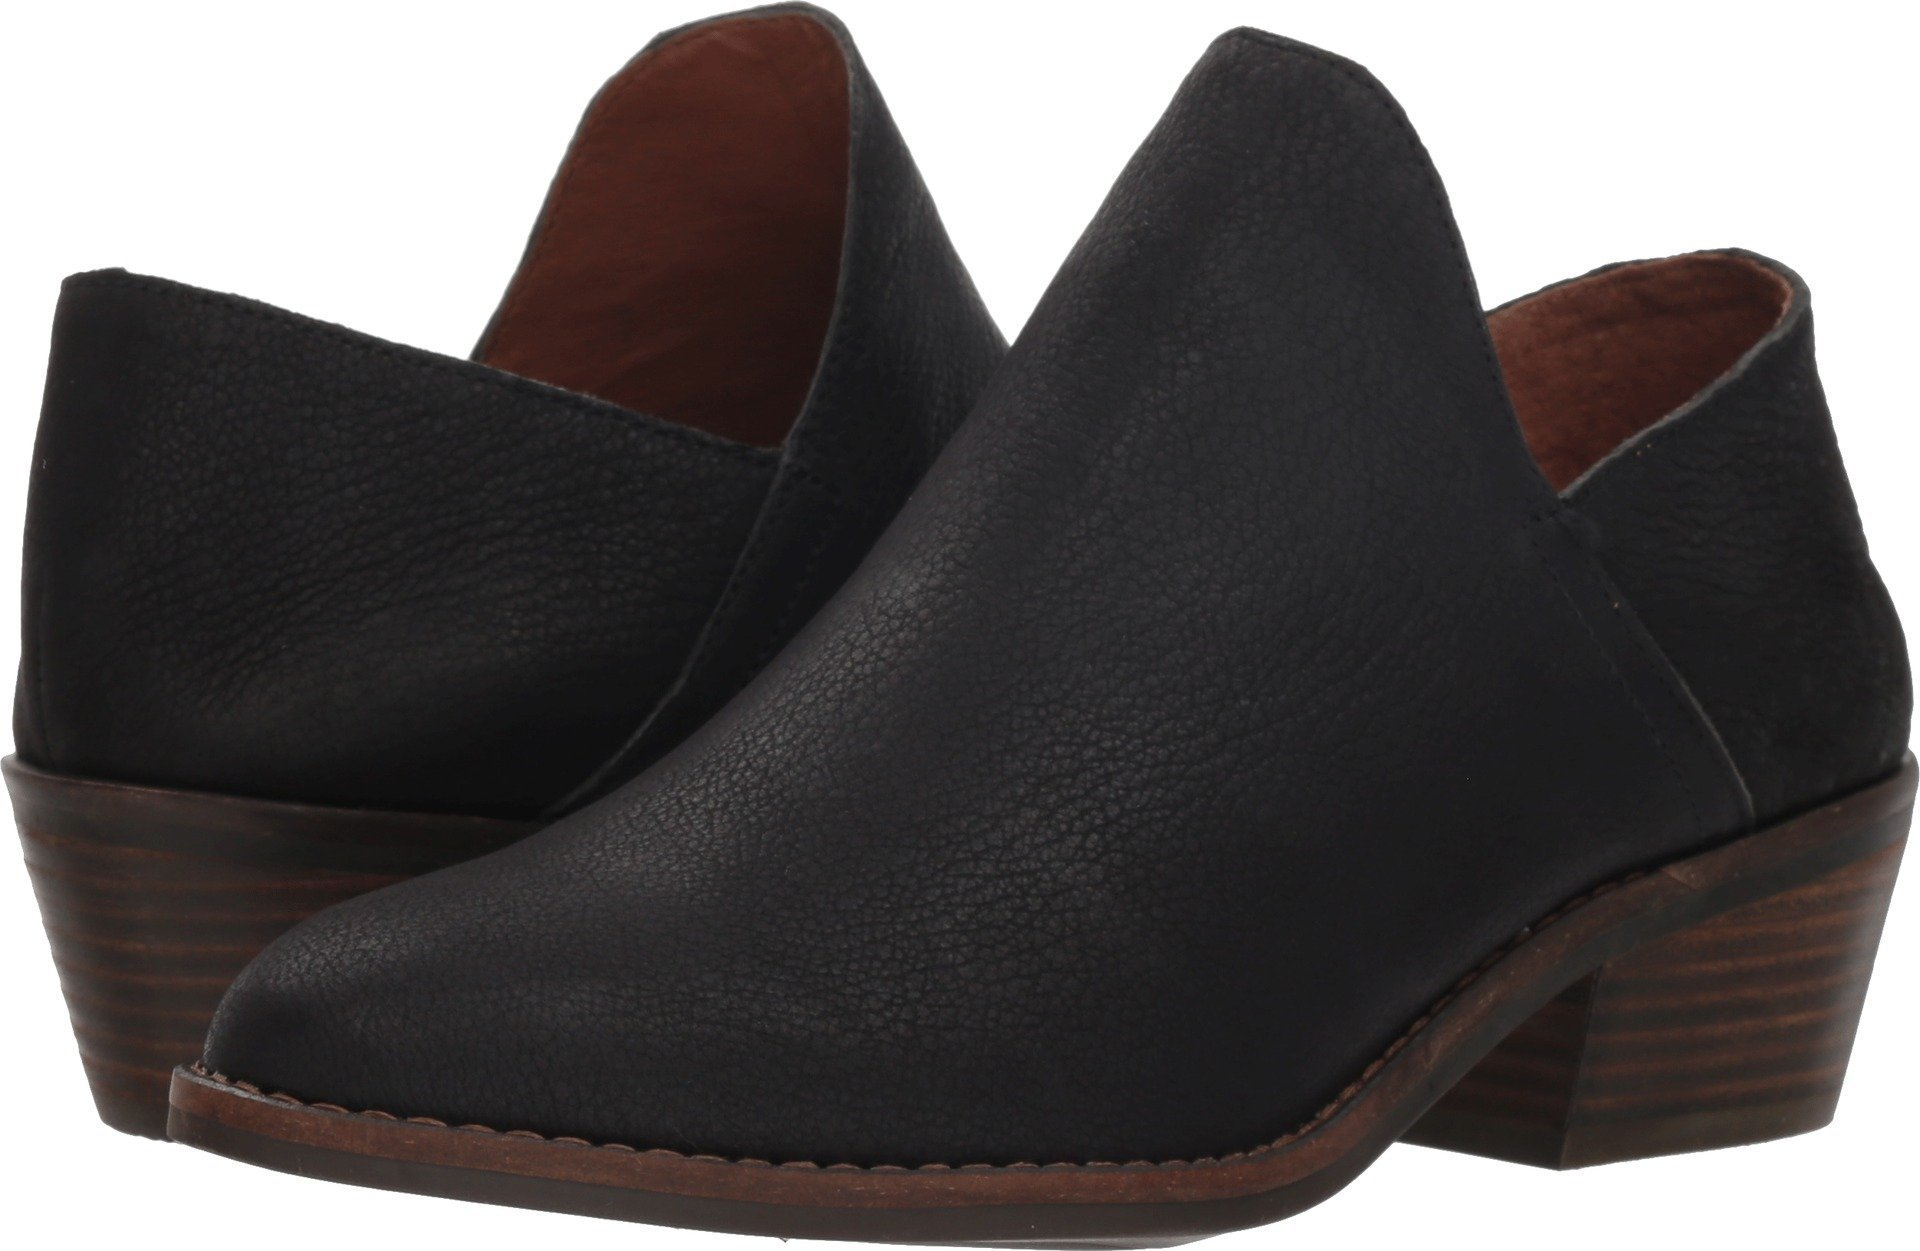 Lucky Brand Women's Fausst Ankle Boot, Black, 8 Medium US